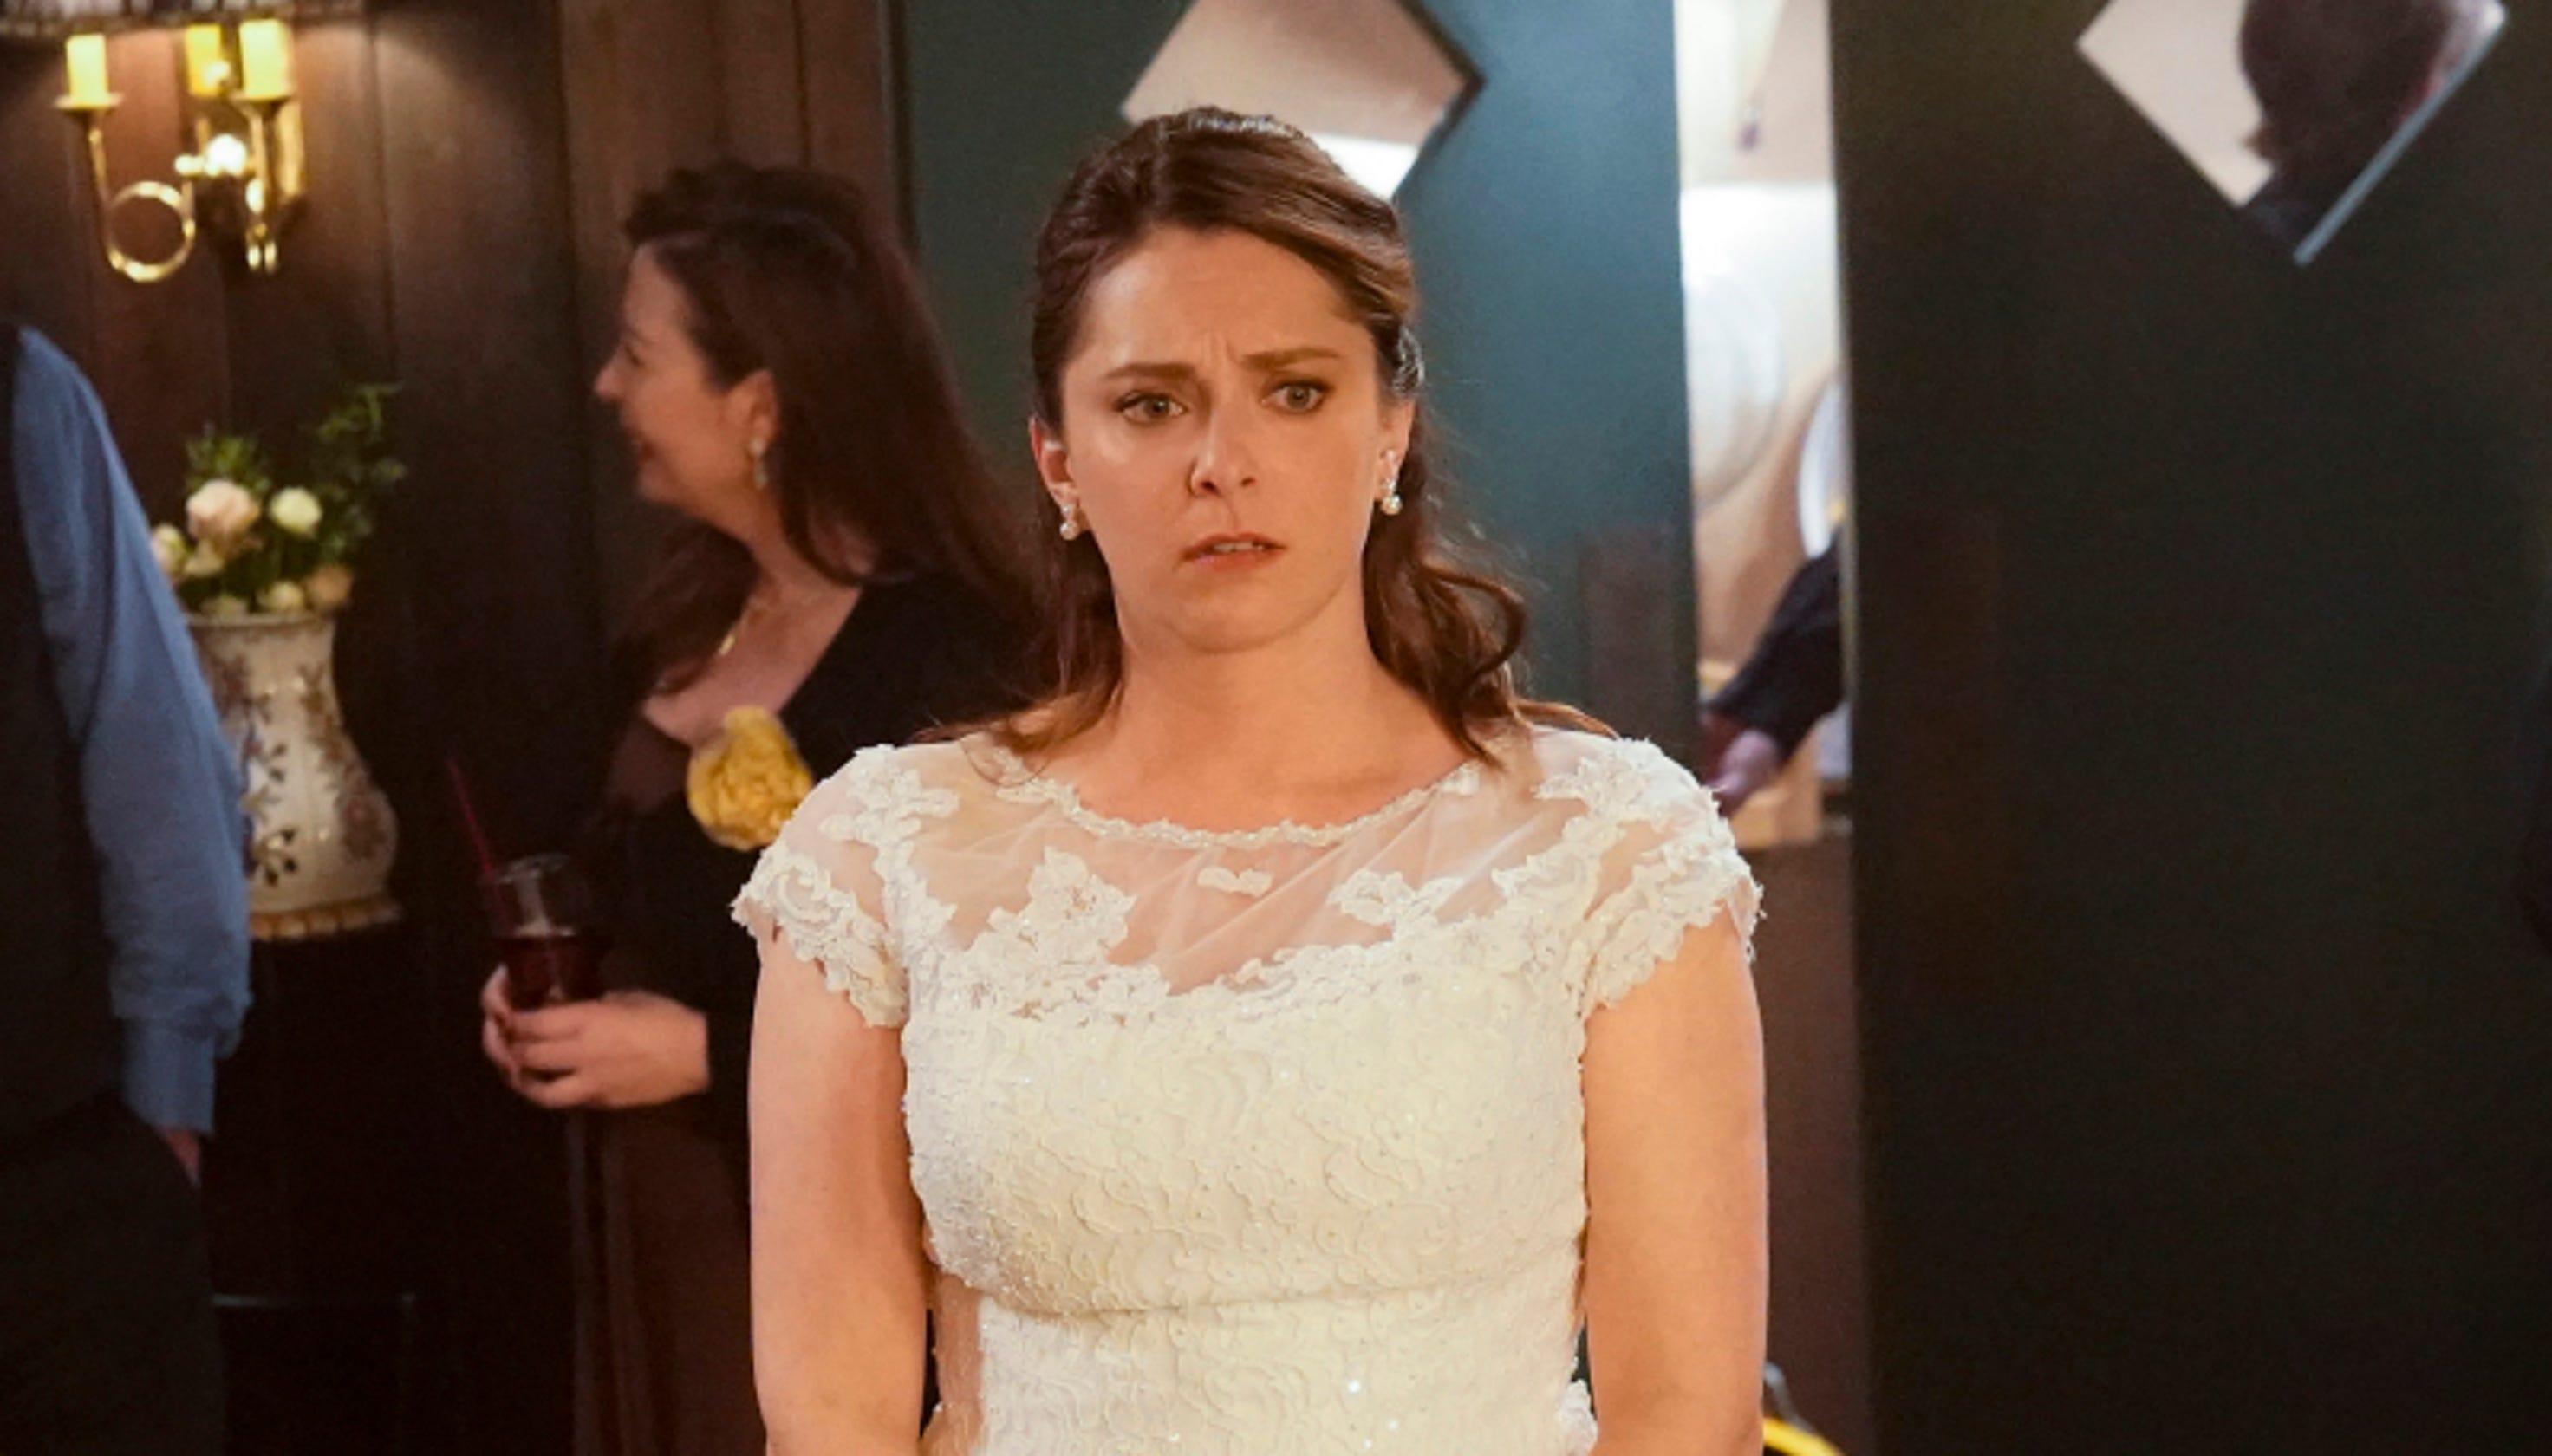 Crazy Ex-Girlfriend Season 2 Finale Episode 13 Recap